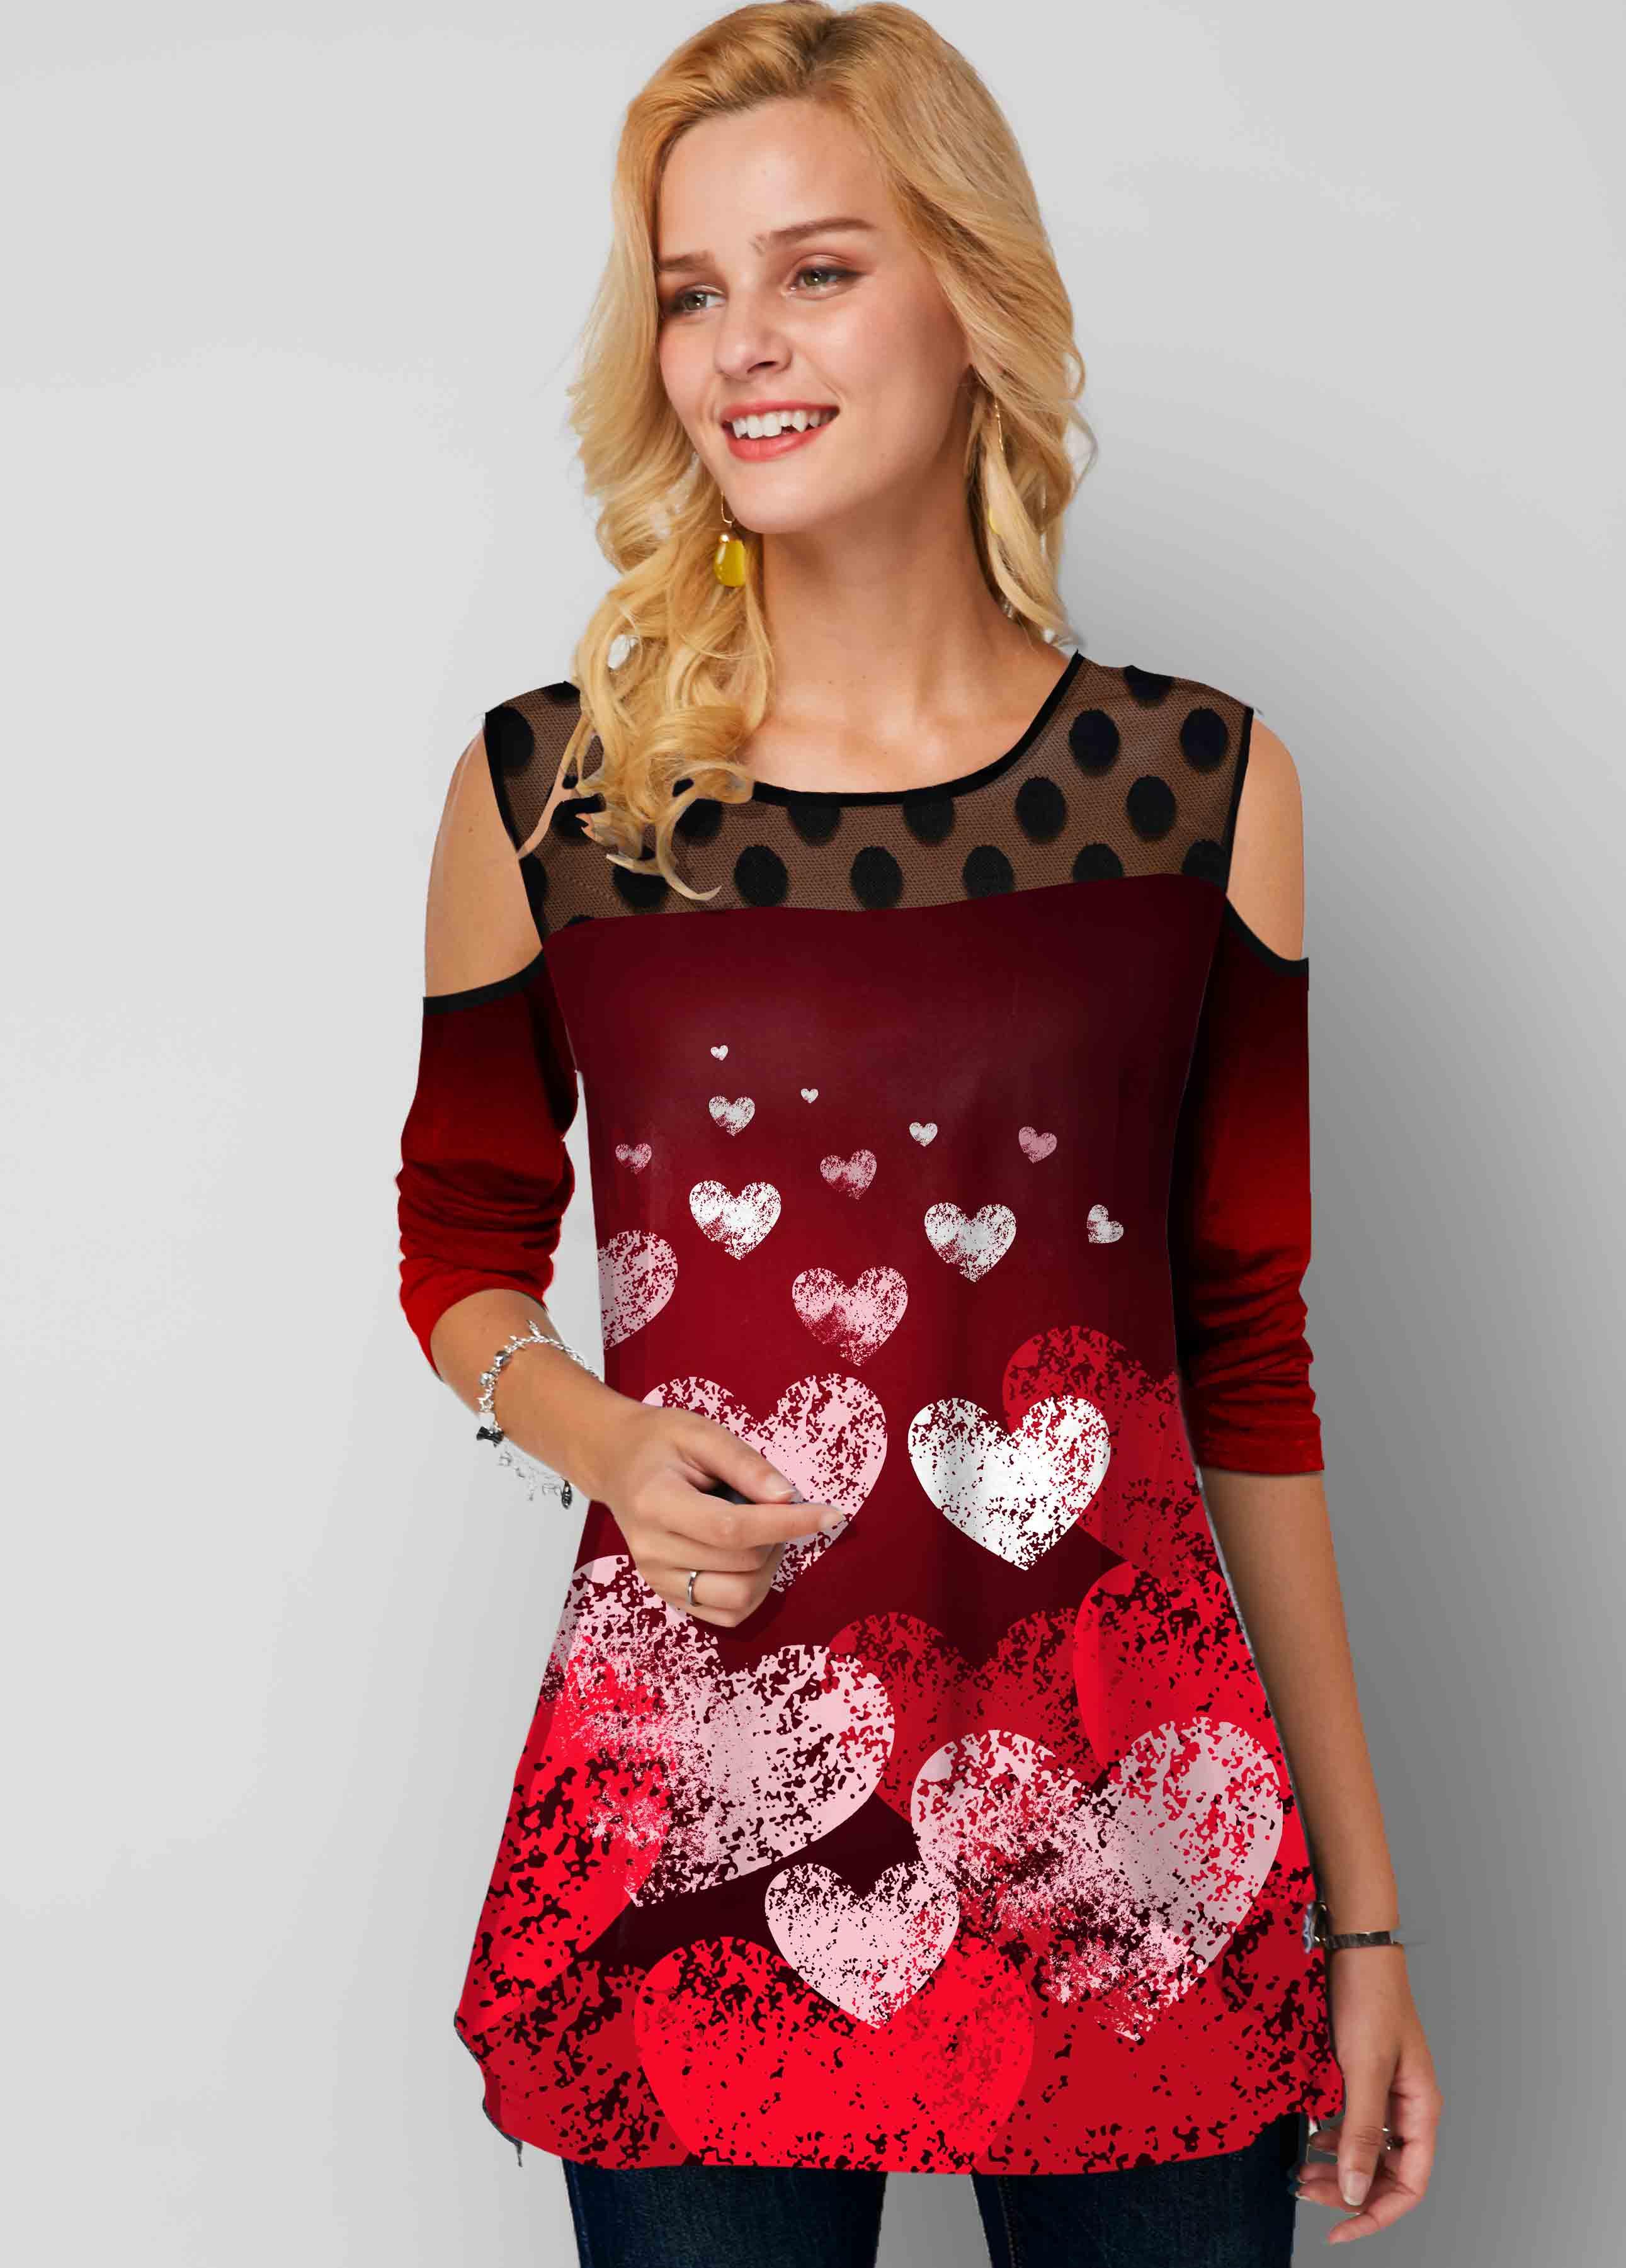 ROTITA Mesh Stitching Heart Print Polka Dot Cold Shoulder Tunic Top